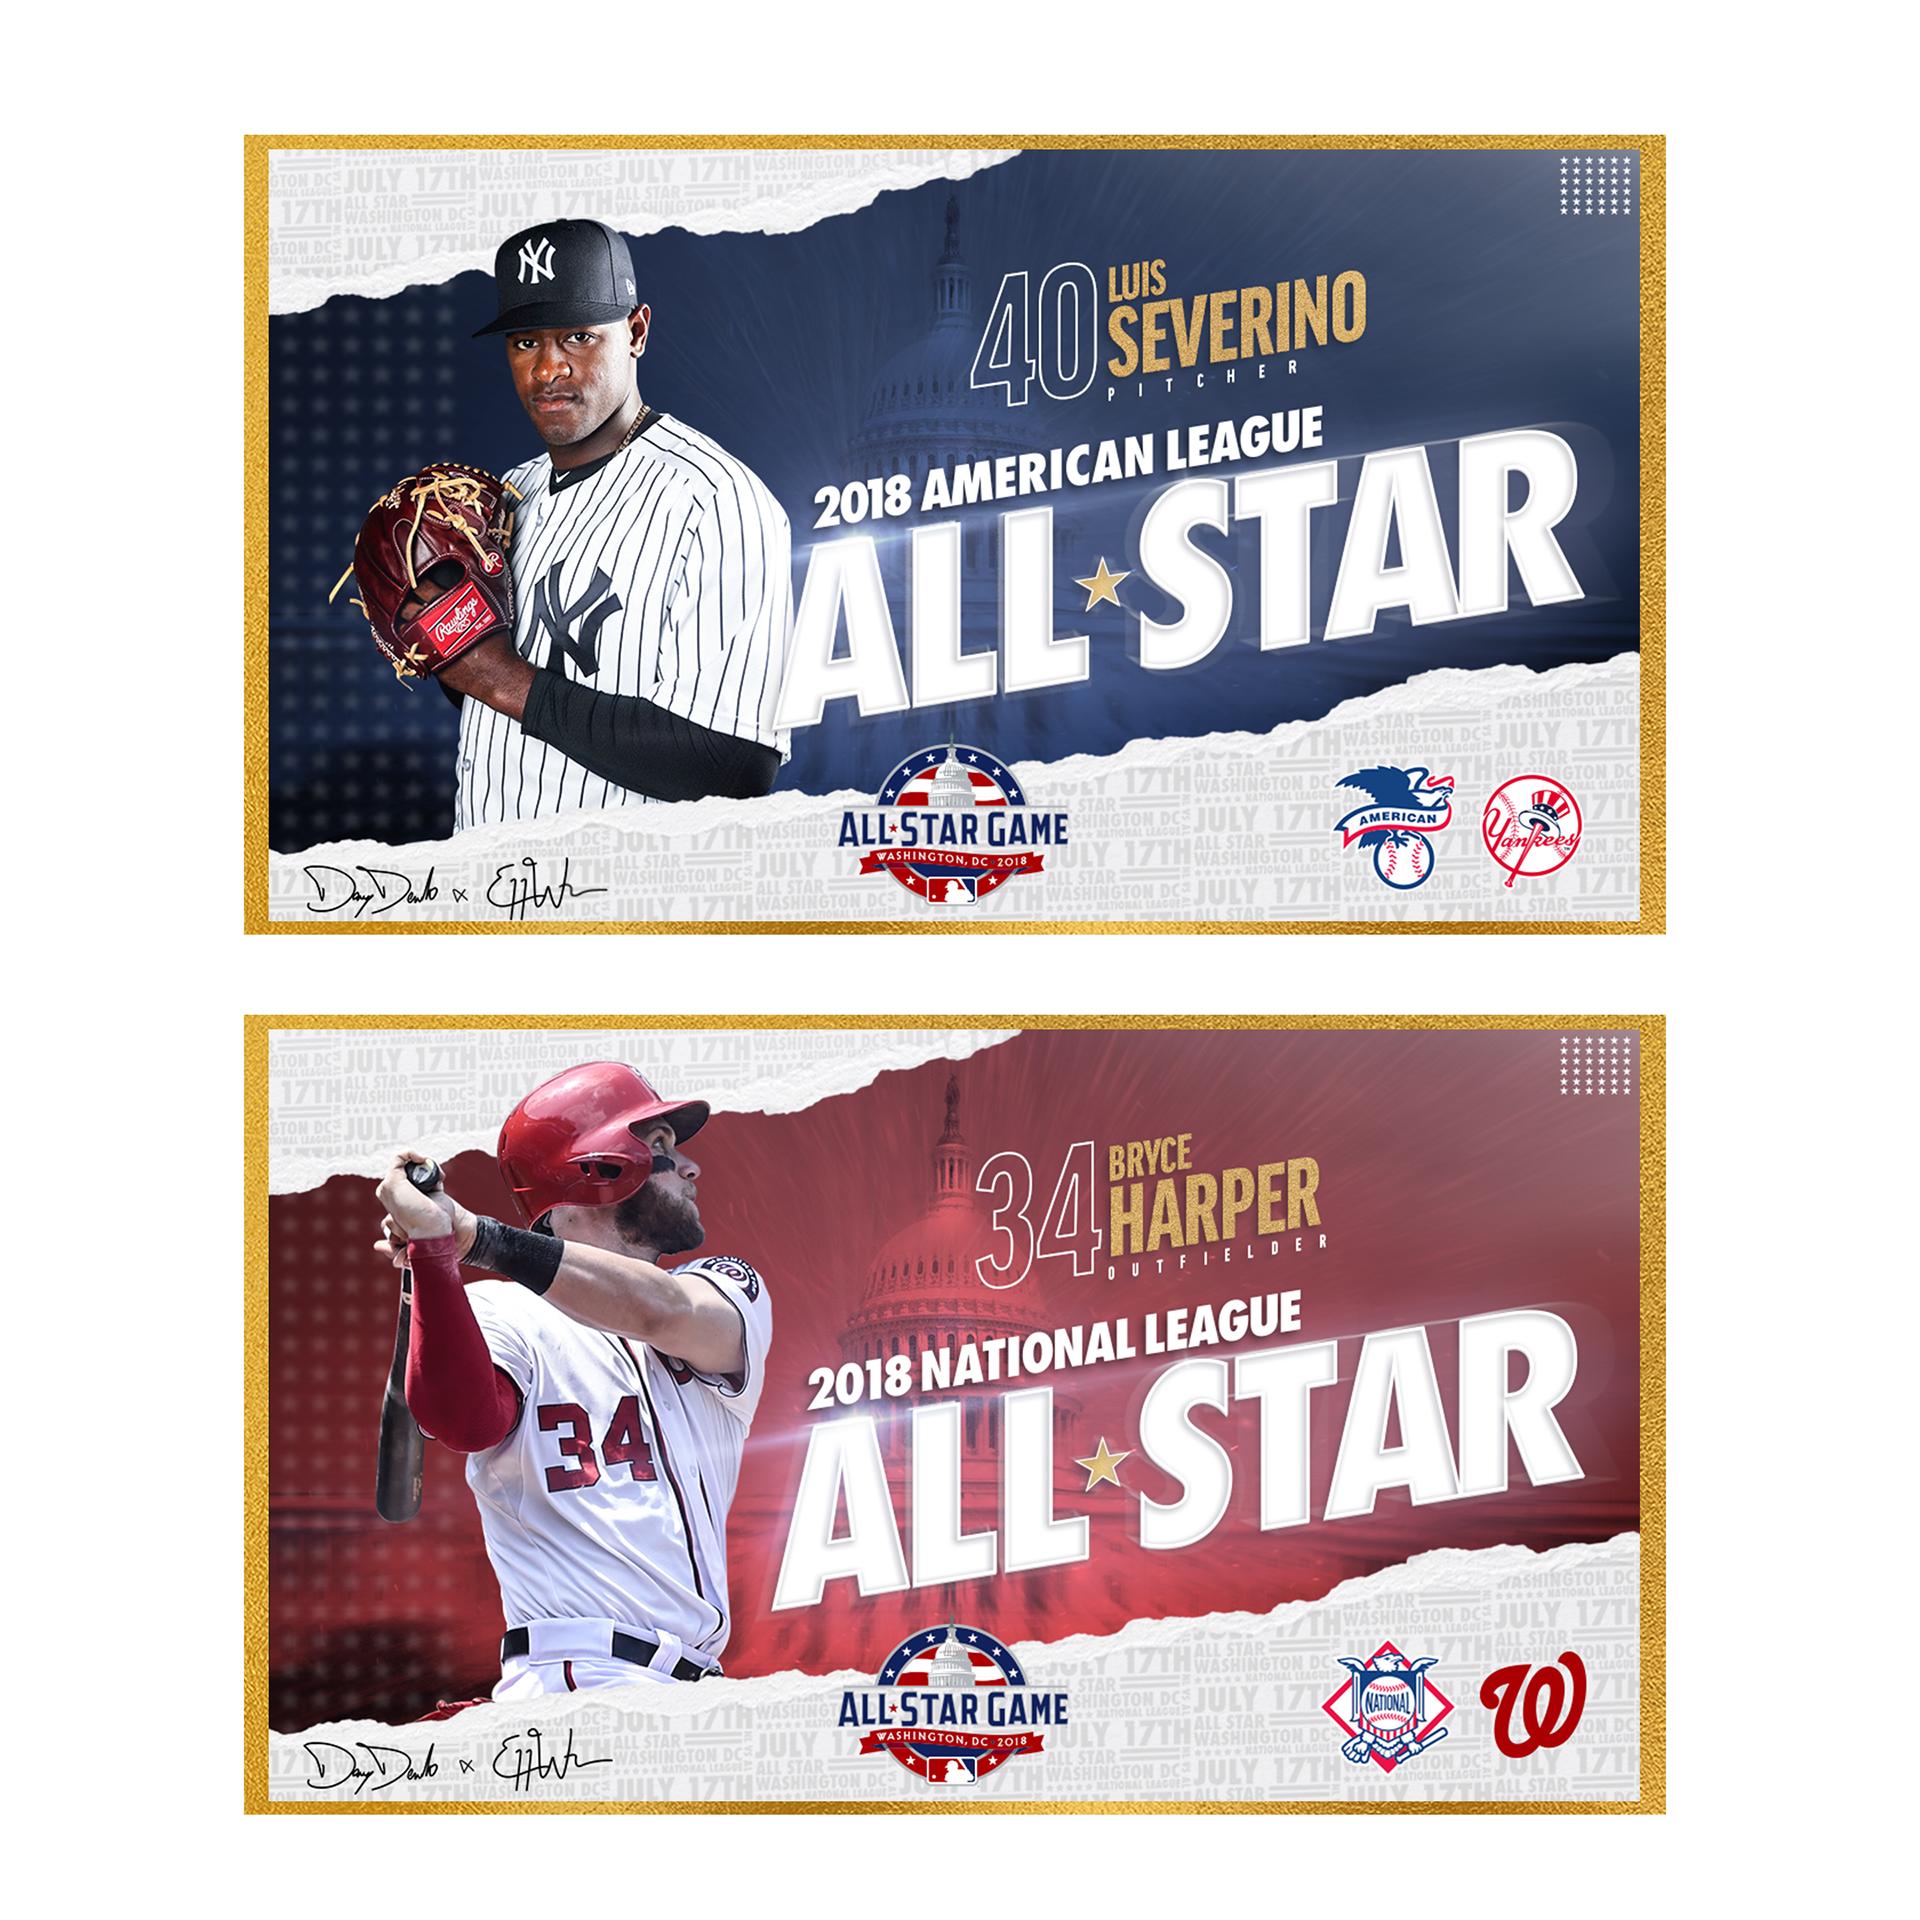 2018 Mlb All Star Game On Behance Sports Graphic Design Baseball Poster Design Sports Design Inspiration